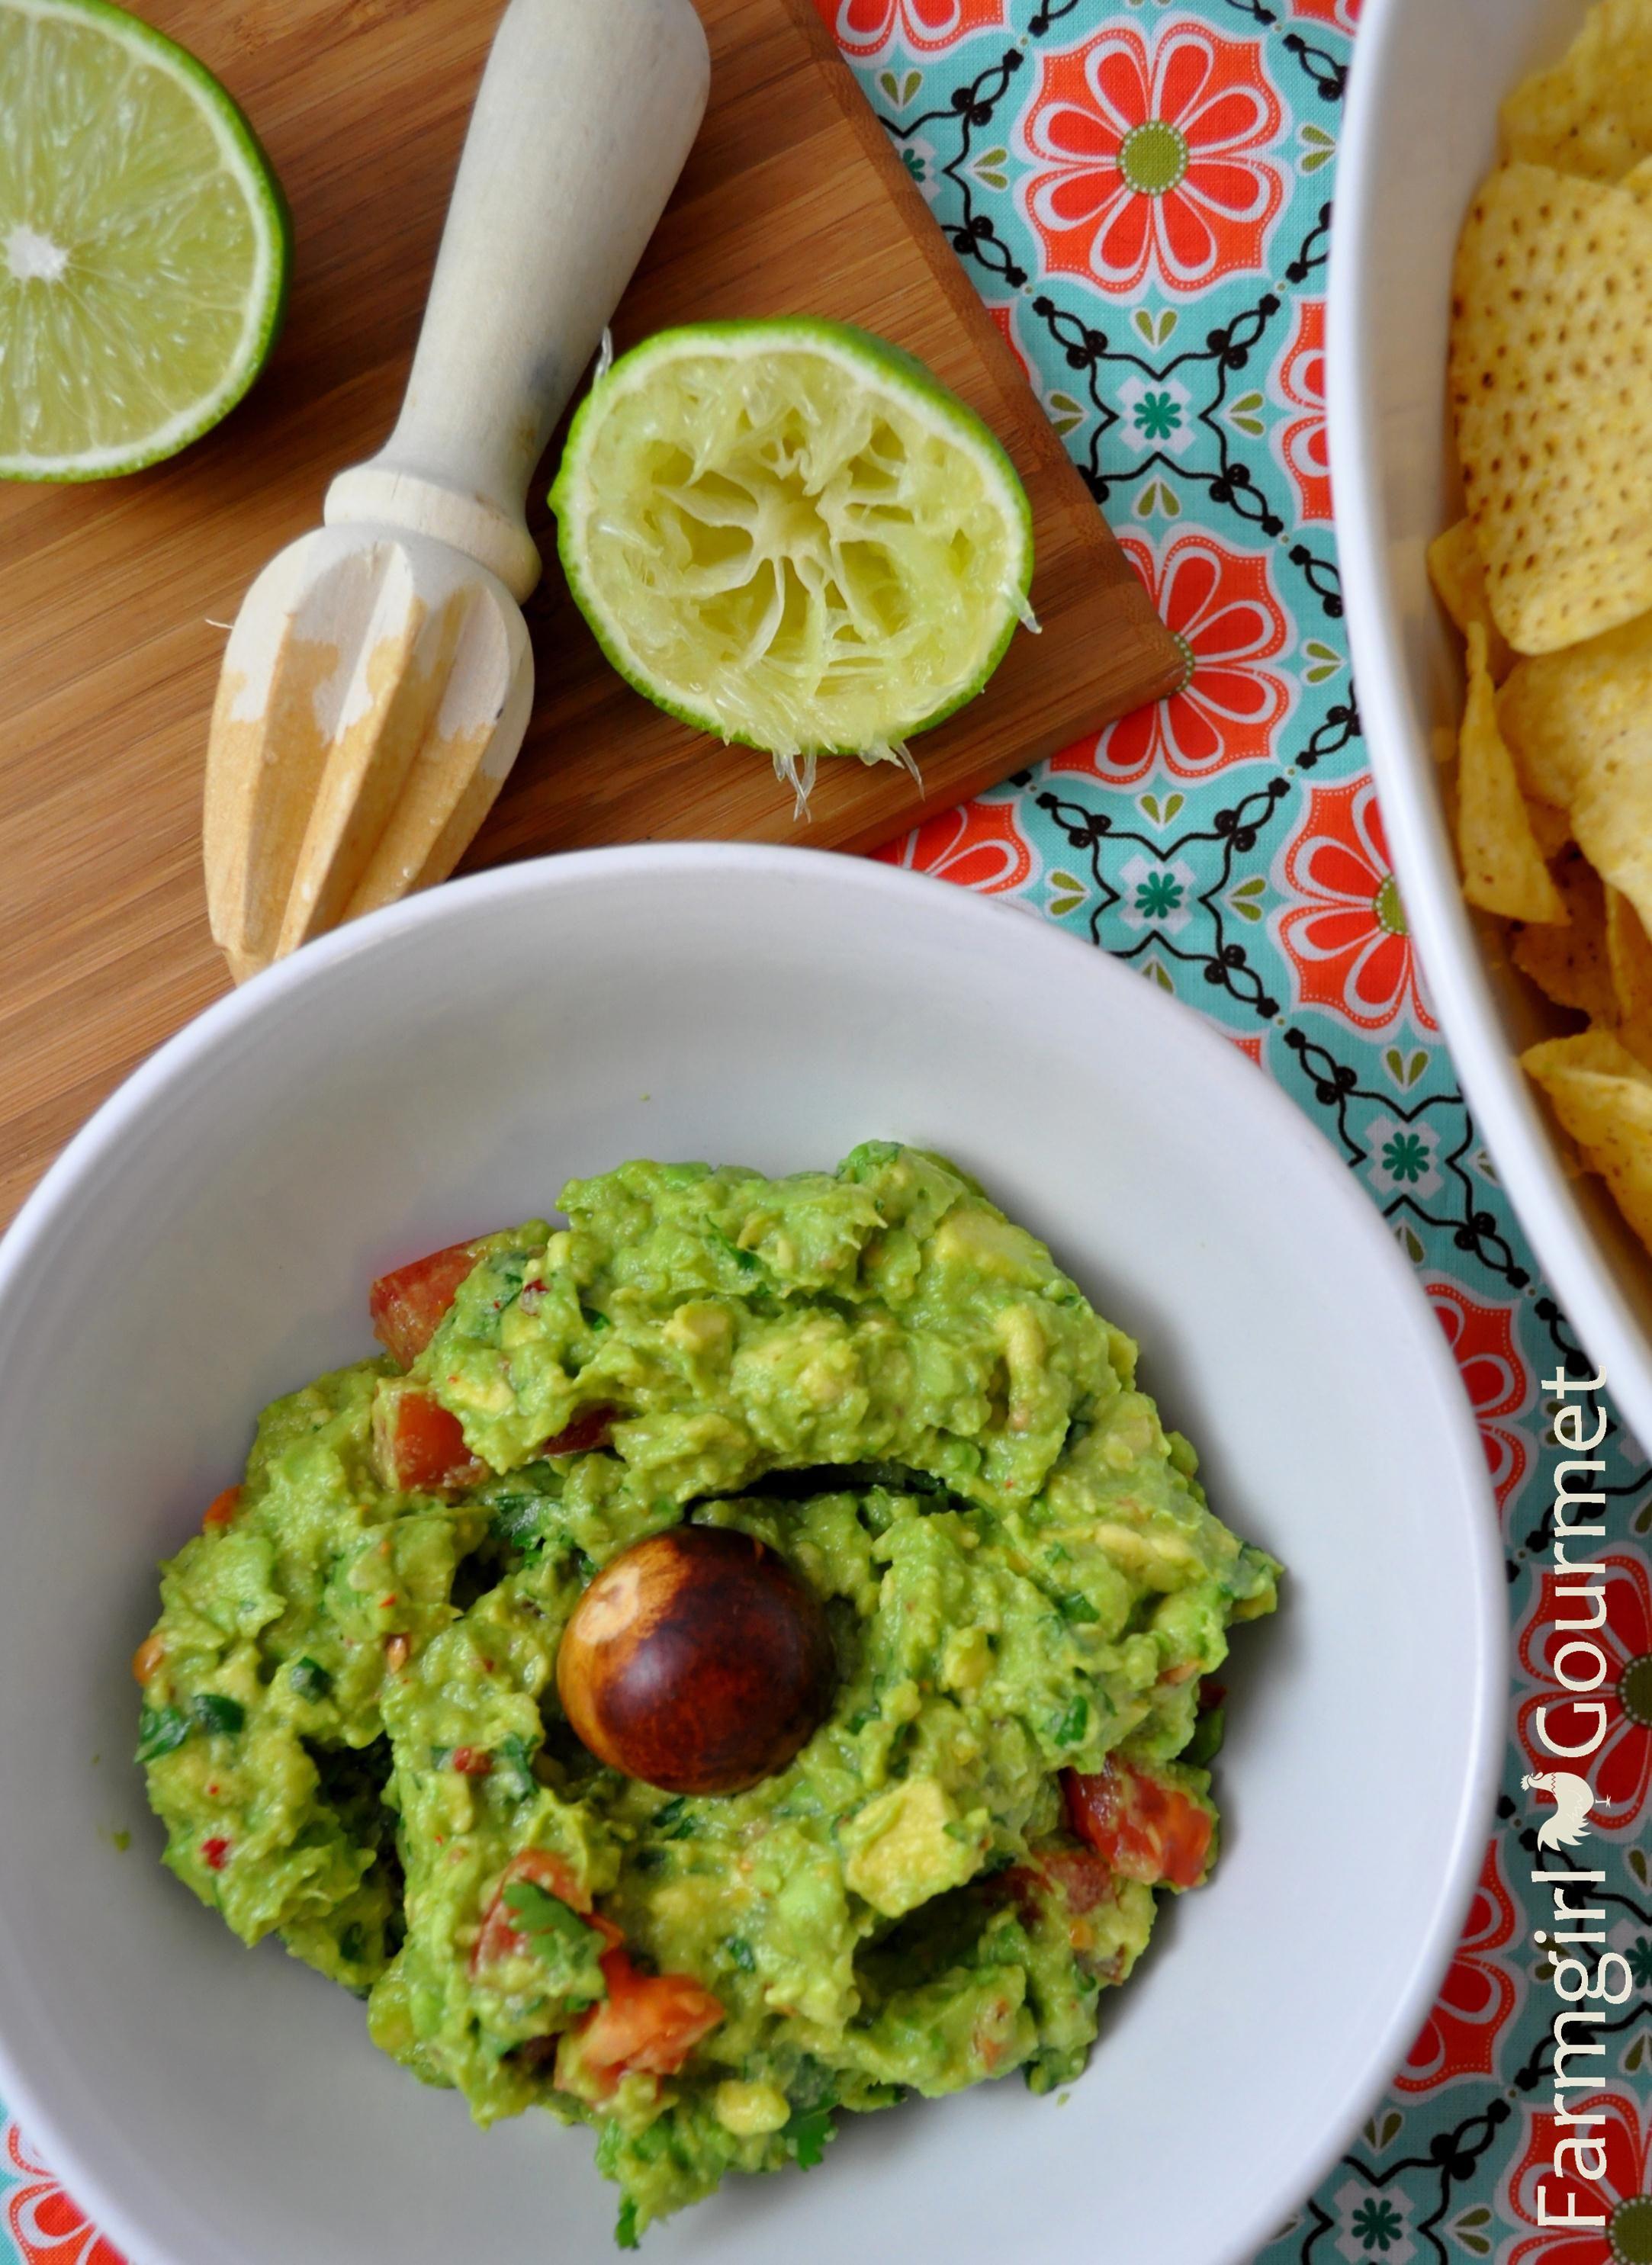 Can You Substitute Lime For Lemon In Guacamole Simply Delicious Guacamole Recipe Recipies Guacamole Mexican Food Recipes Guacamole Recipe